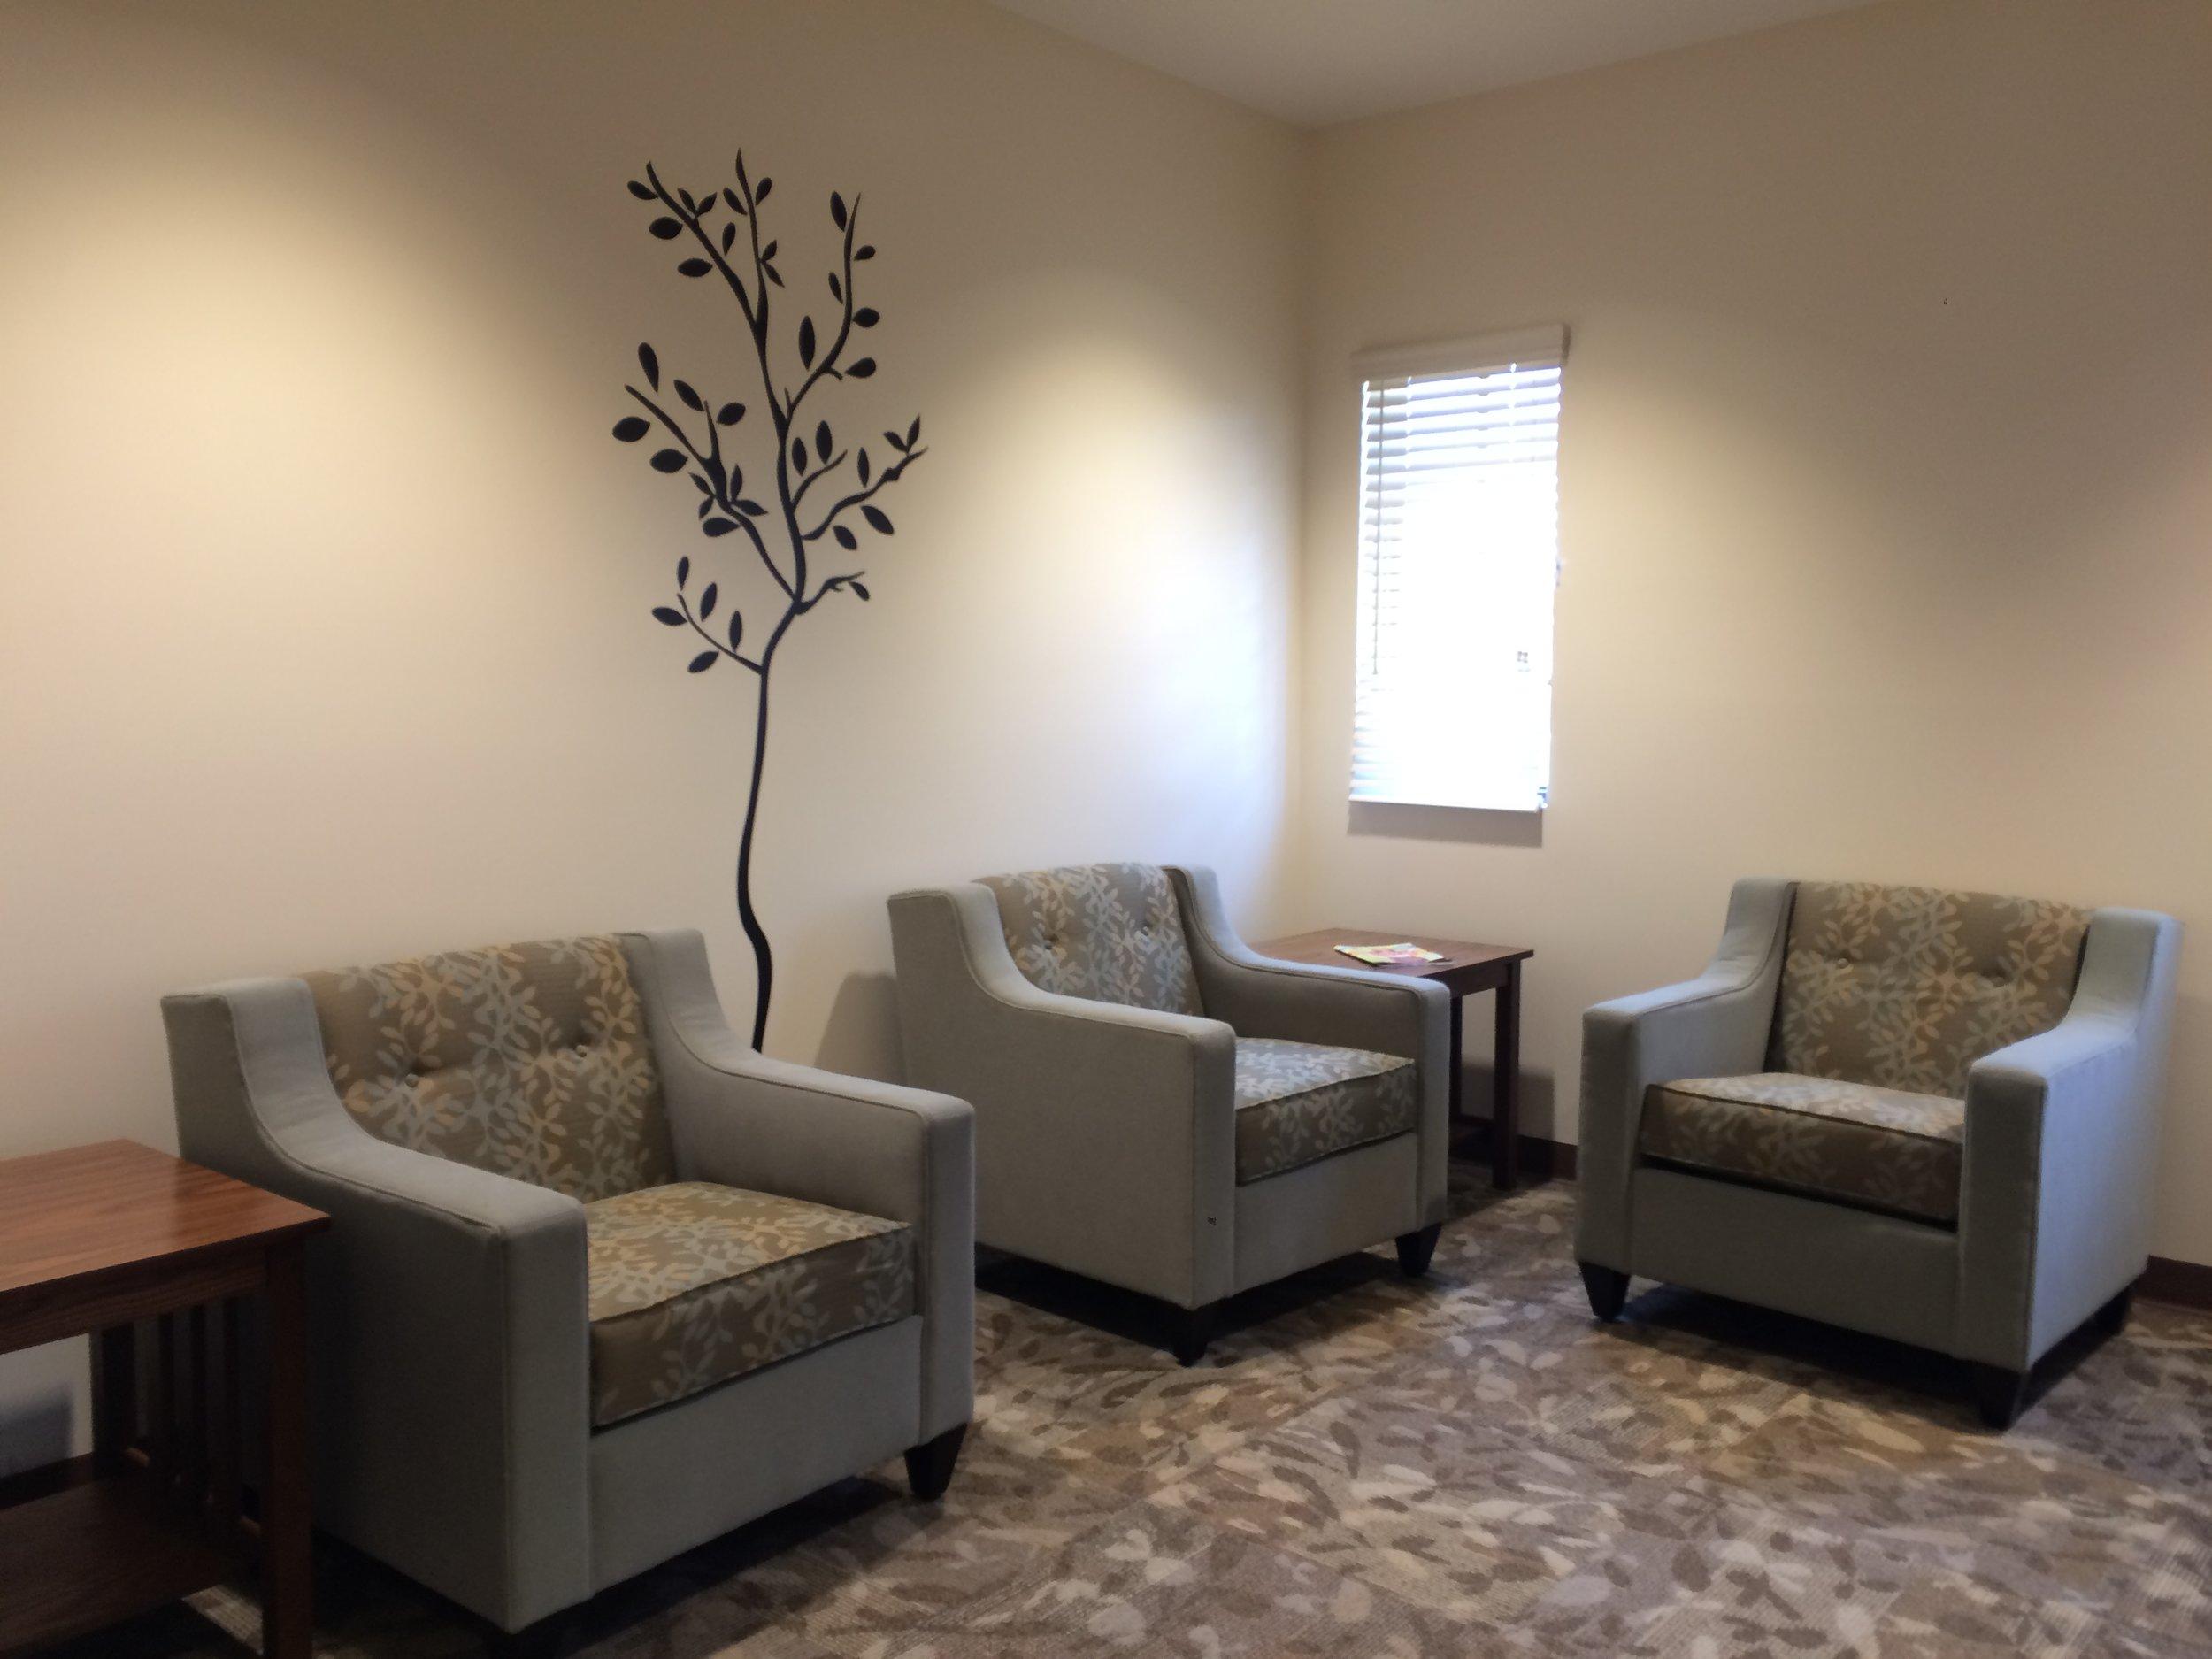 Waiting Room - Copy.JPG